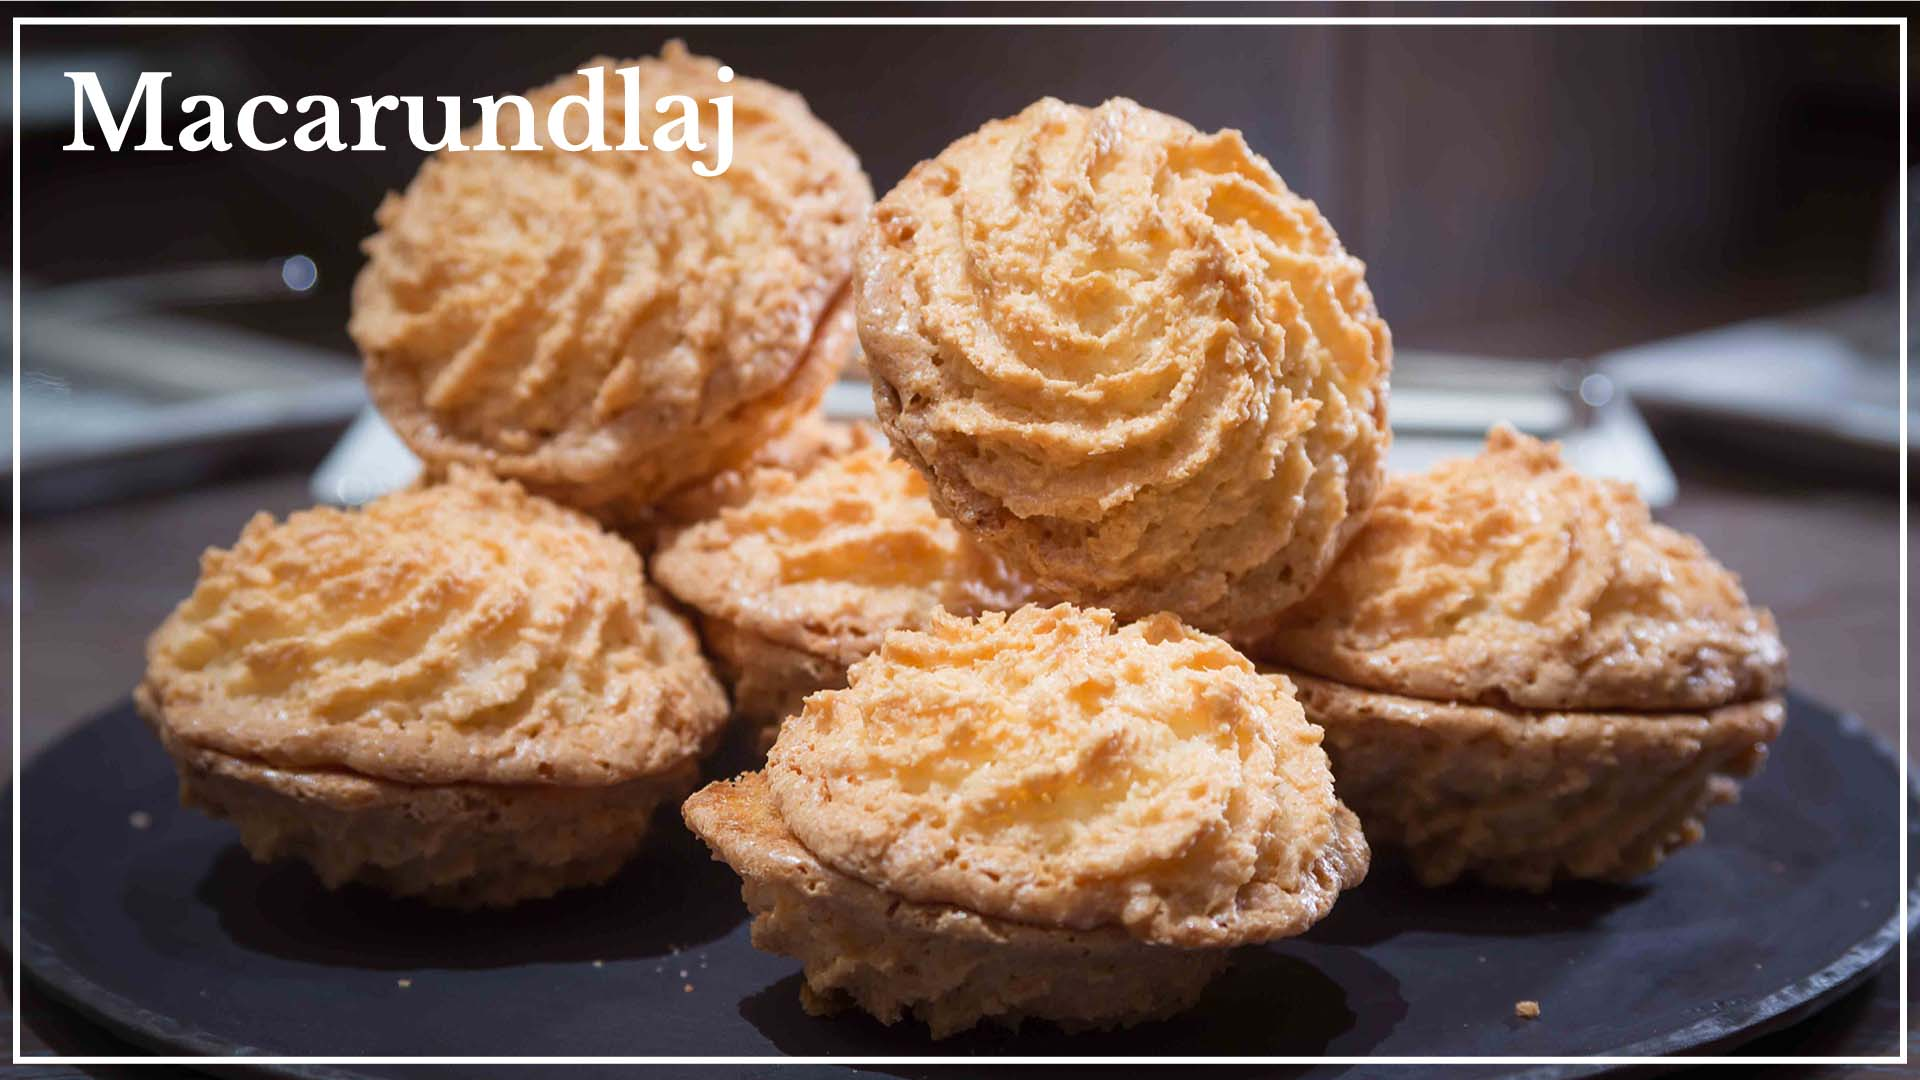 Macarundlaj based on almonds and peanuts